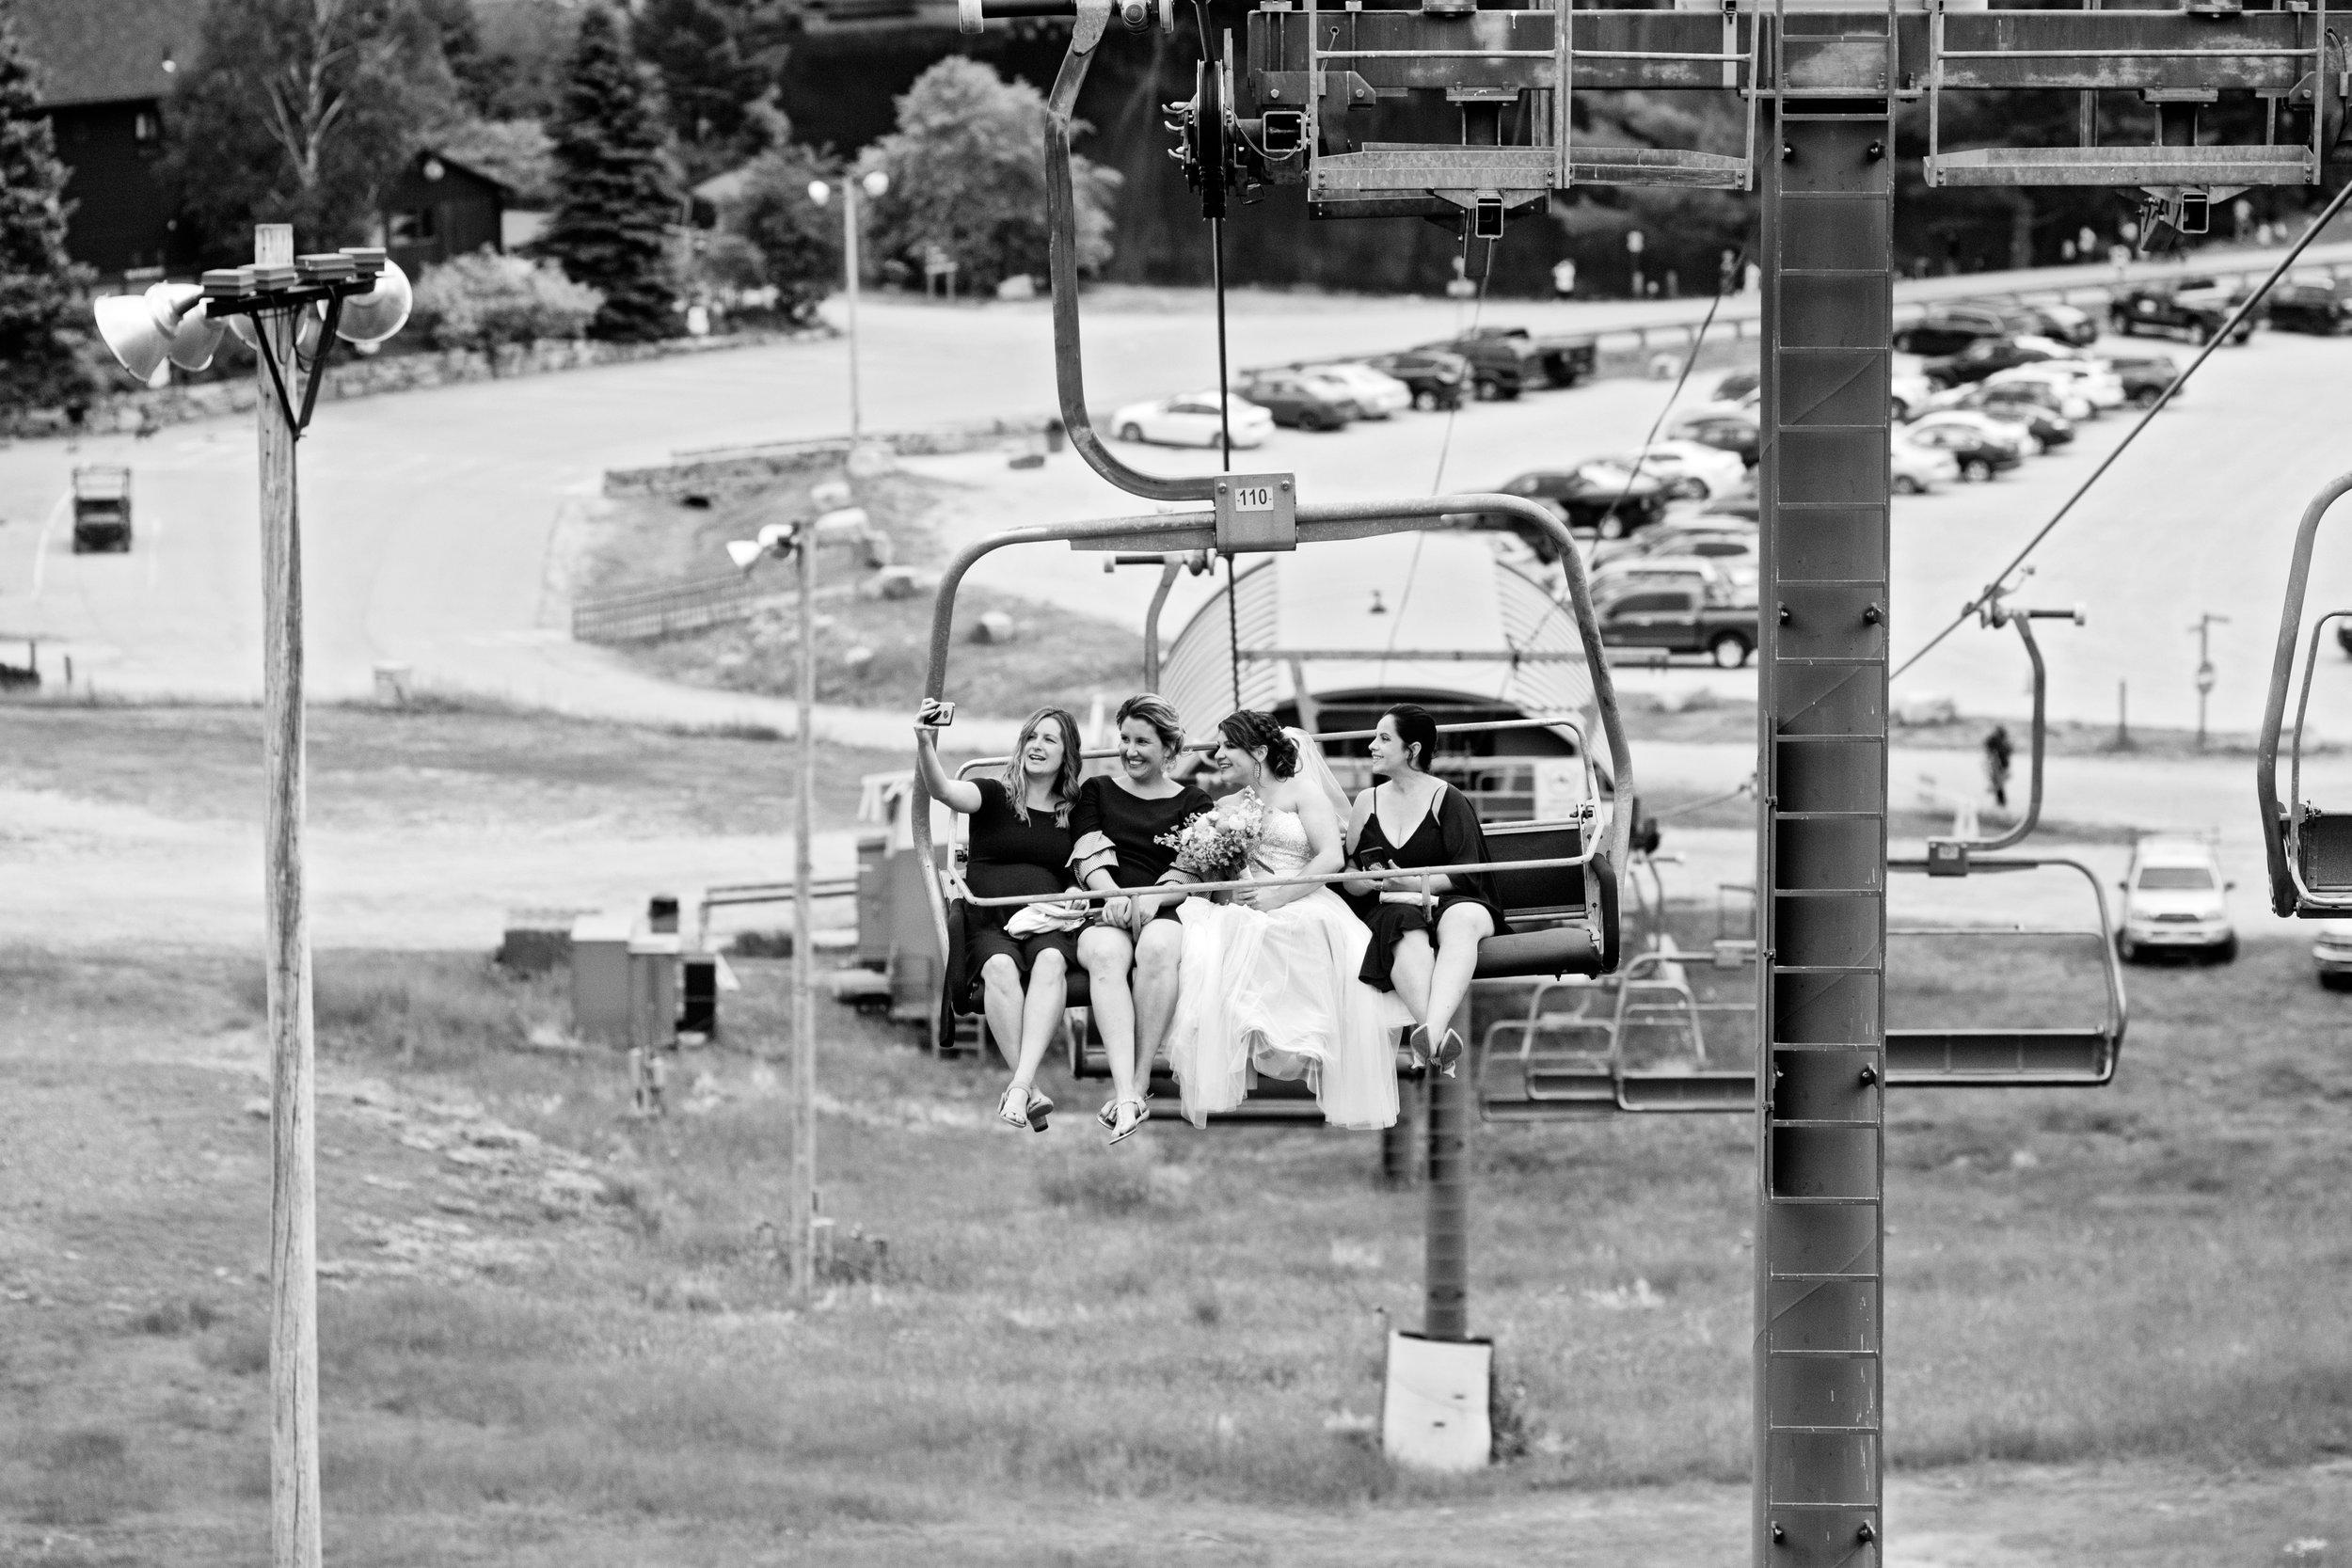 gunstock-mountain-resort-wedding-photos-07.JPG